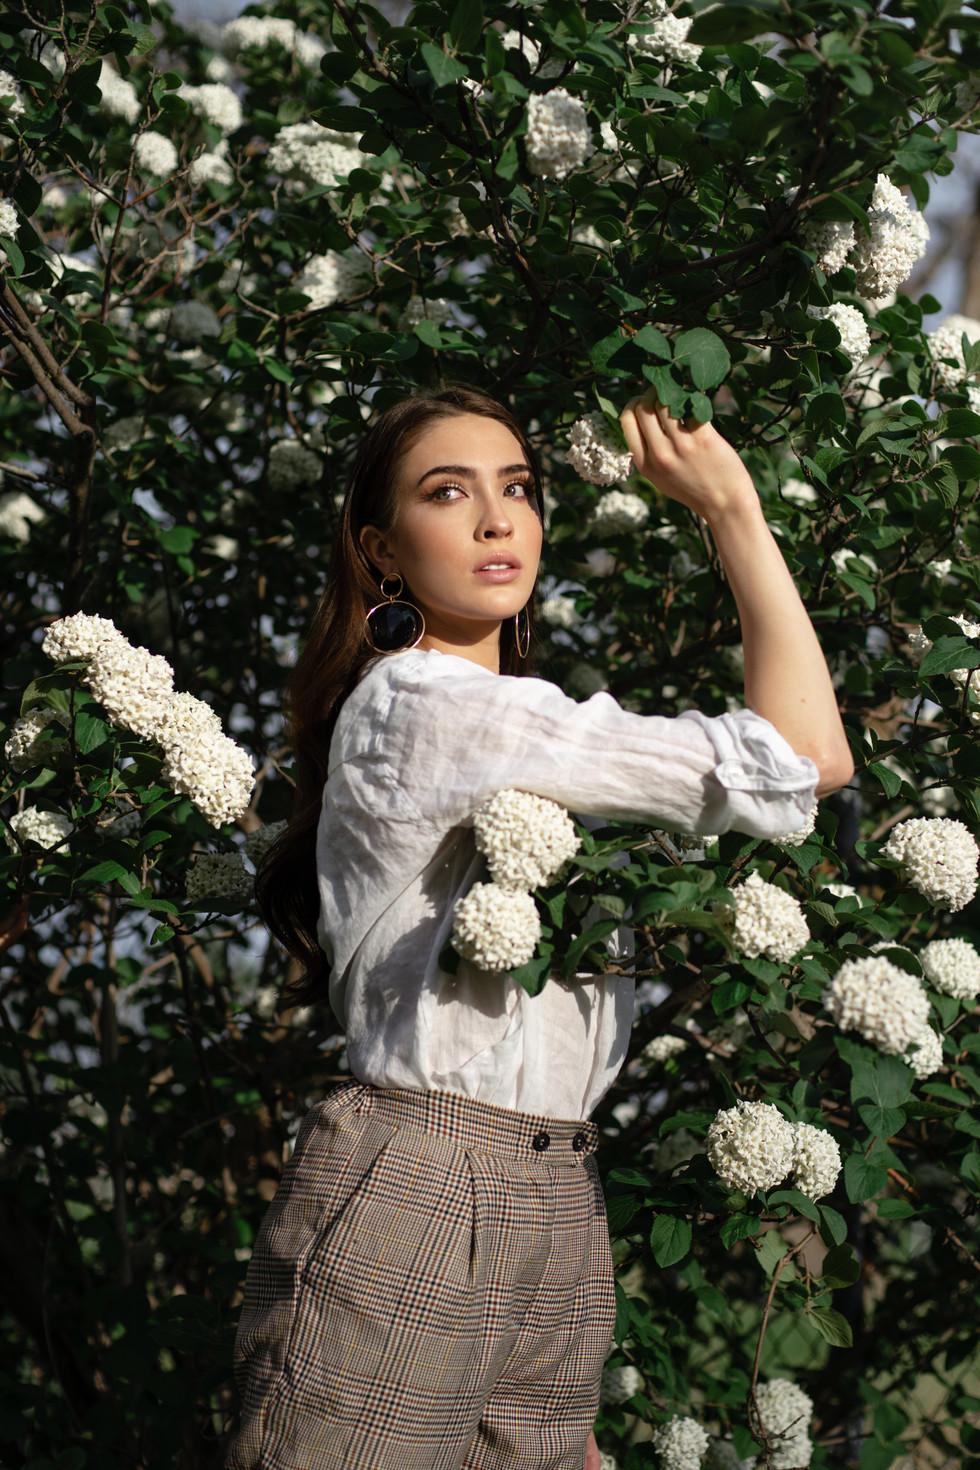 Annalise Johnson - The Girl in the Garden Editorial | Film | Fine Art